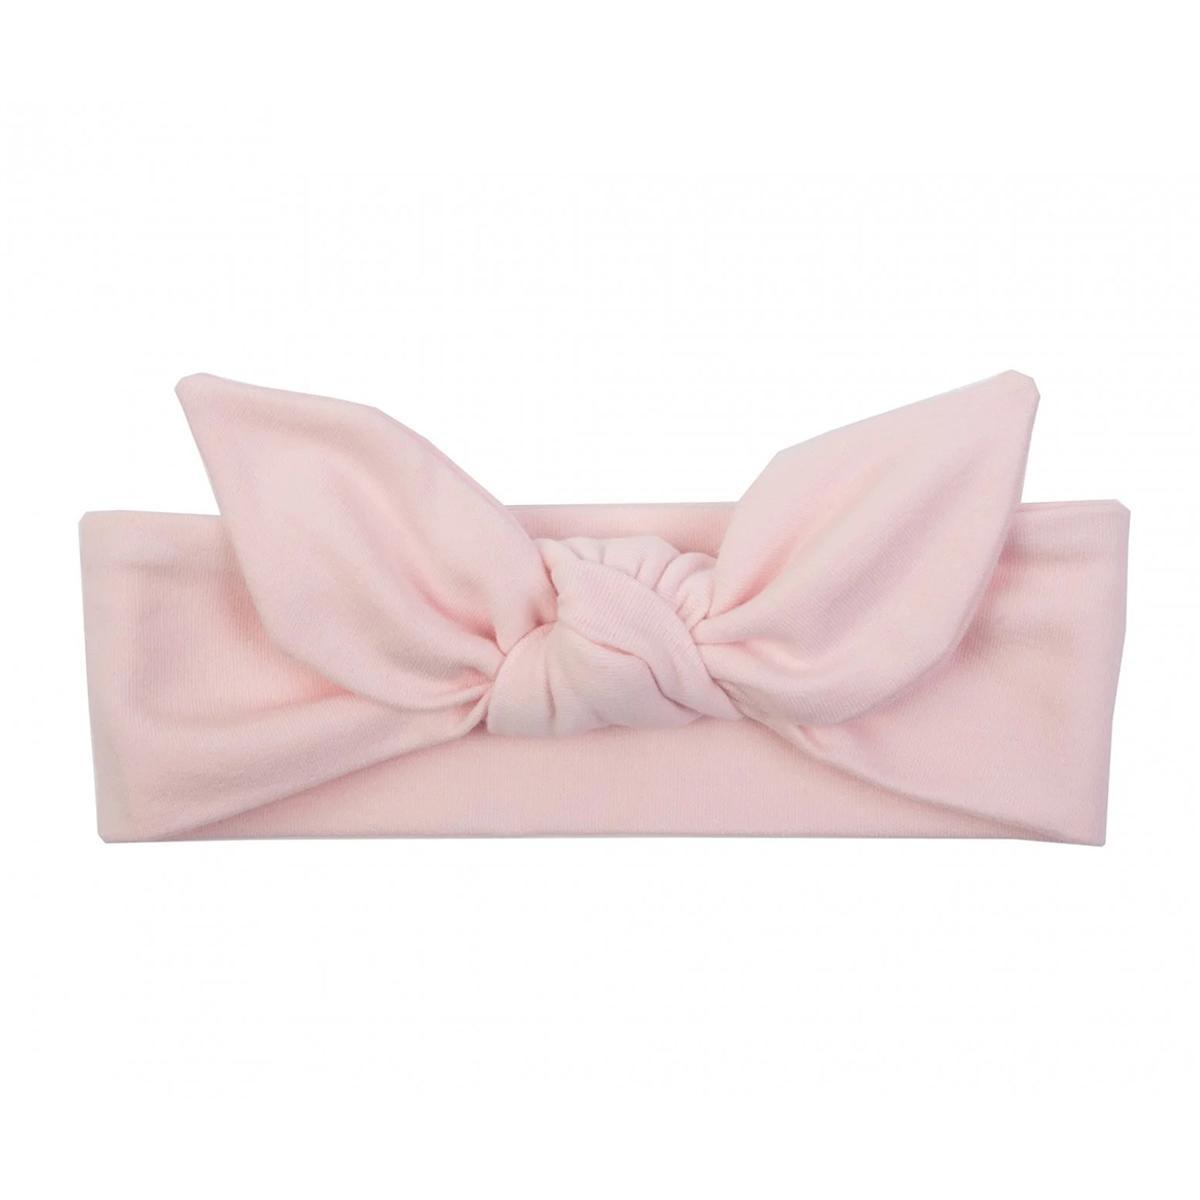 Cinta Infantil para Pelo Powder Pink UL&KA